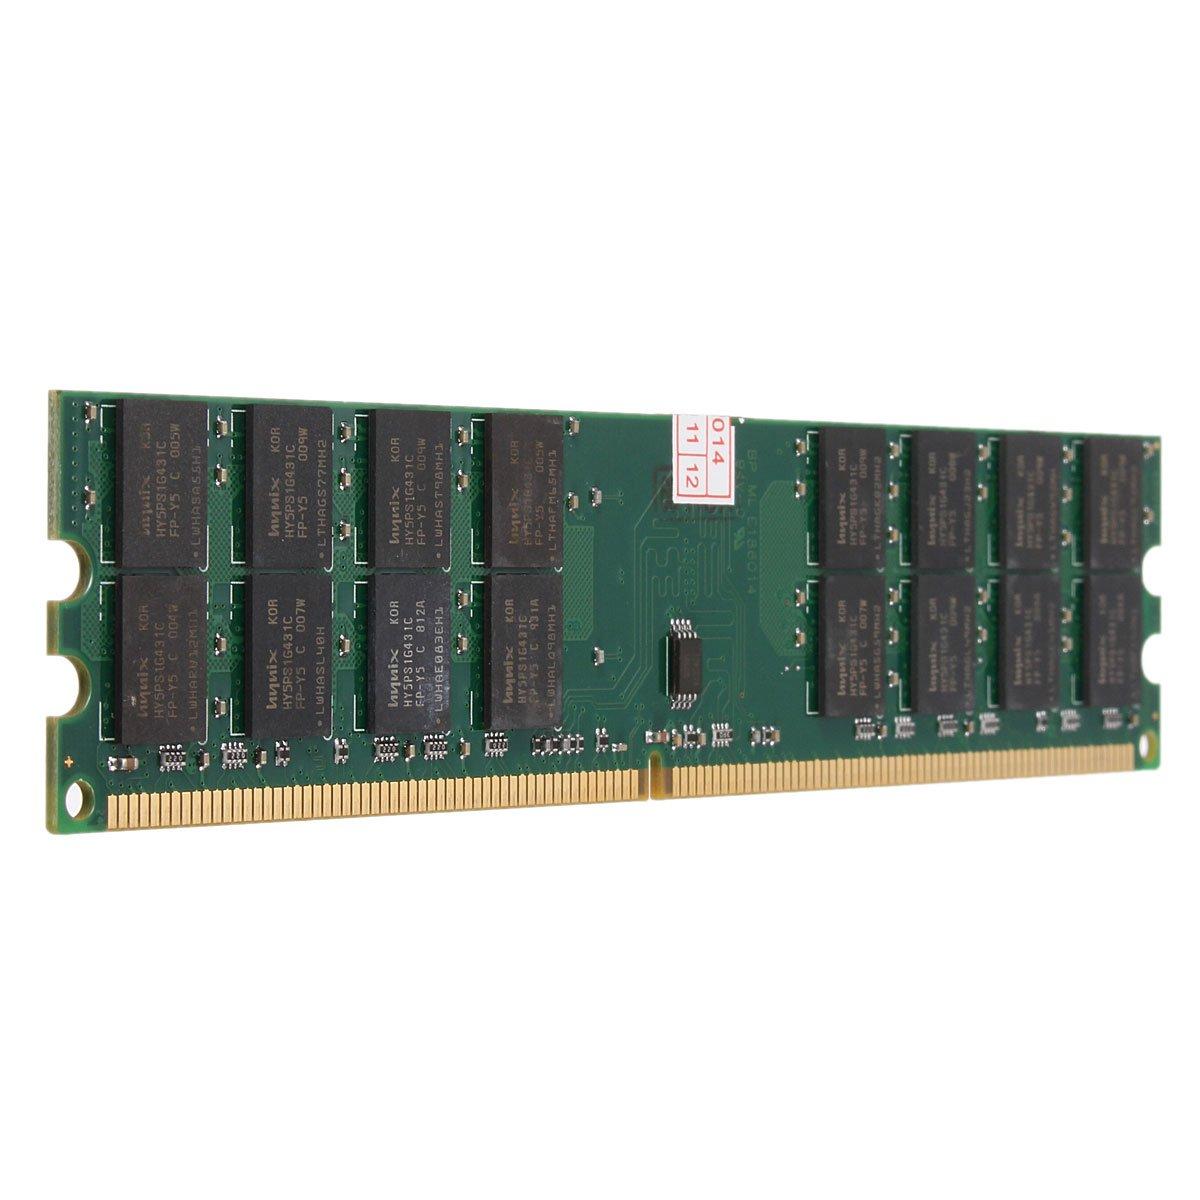 4GB 4G DDR2 800MHZ PC2 6400 Computer Memory RAM PC DIMM